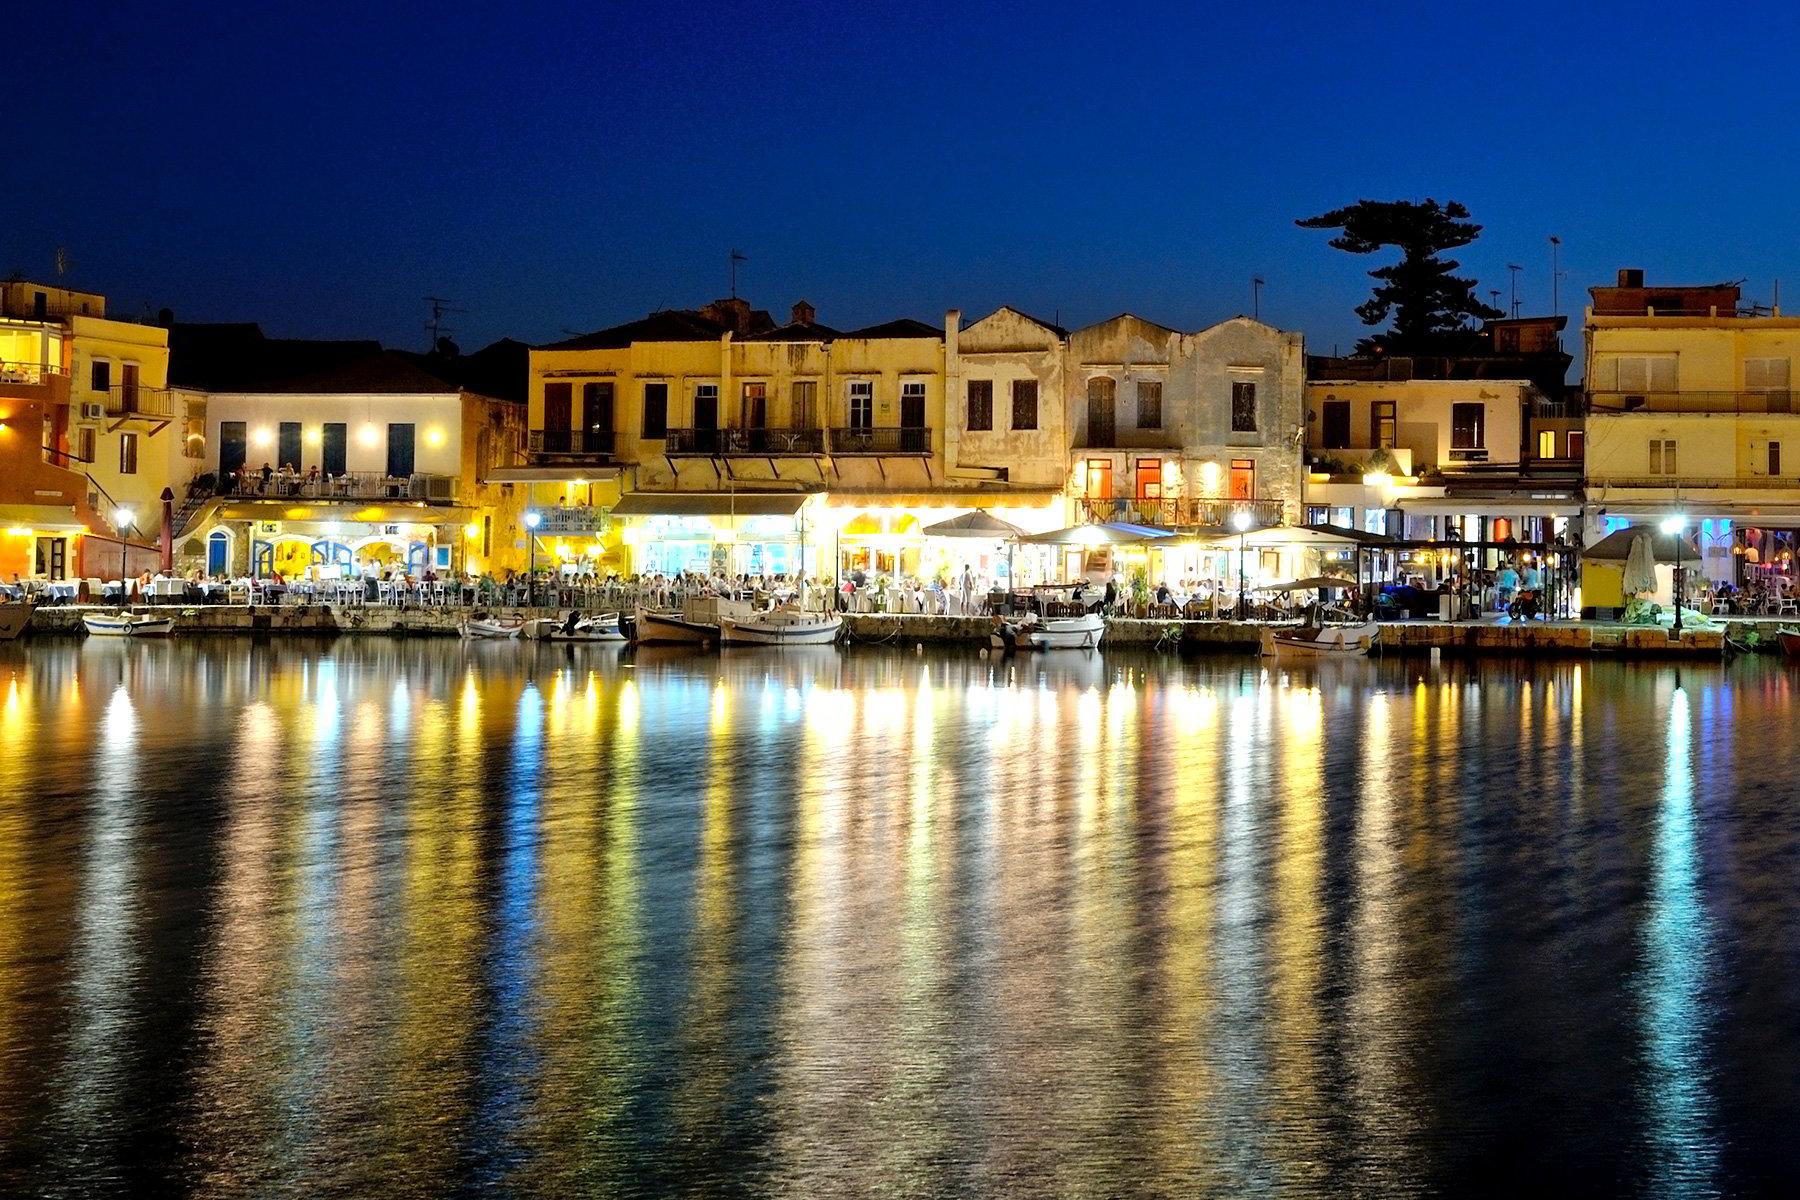 Venetian Harbour of Rethymno in the Evening